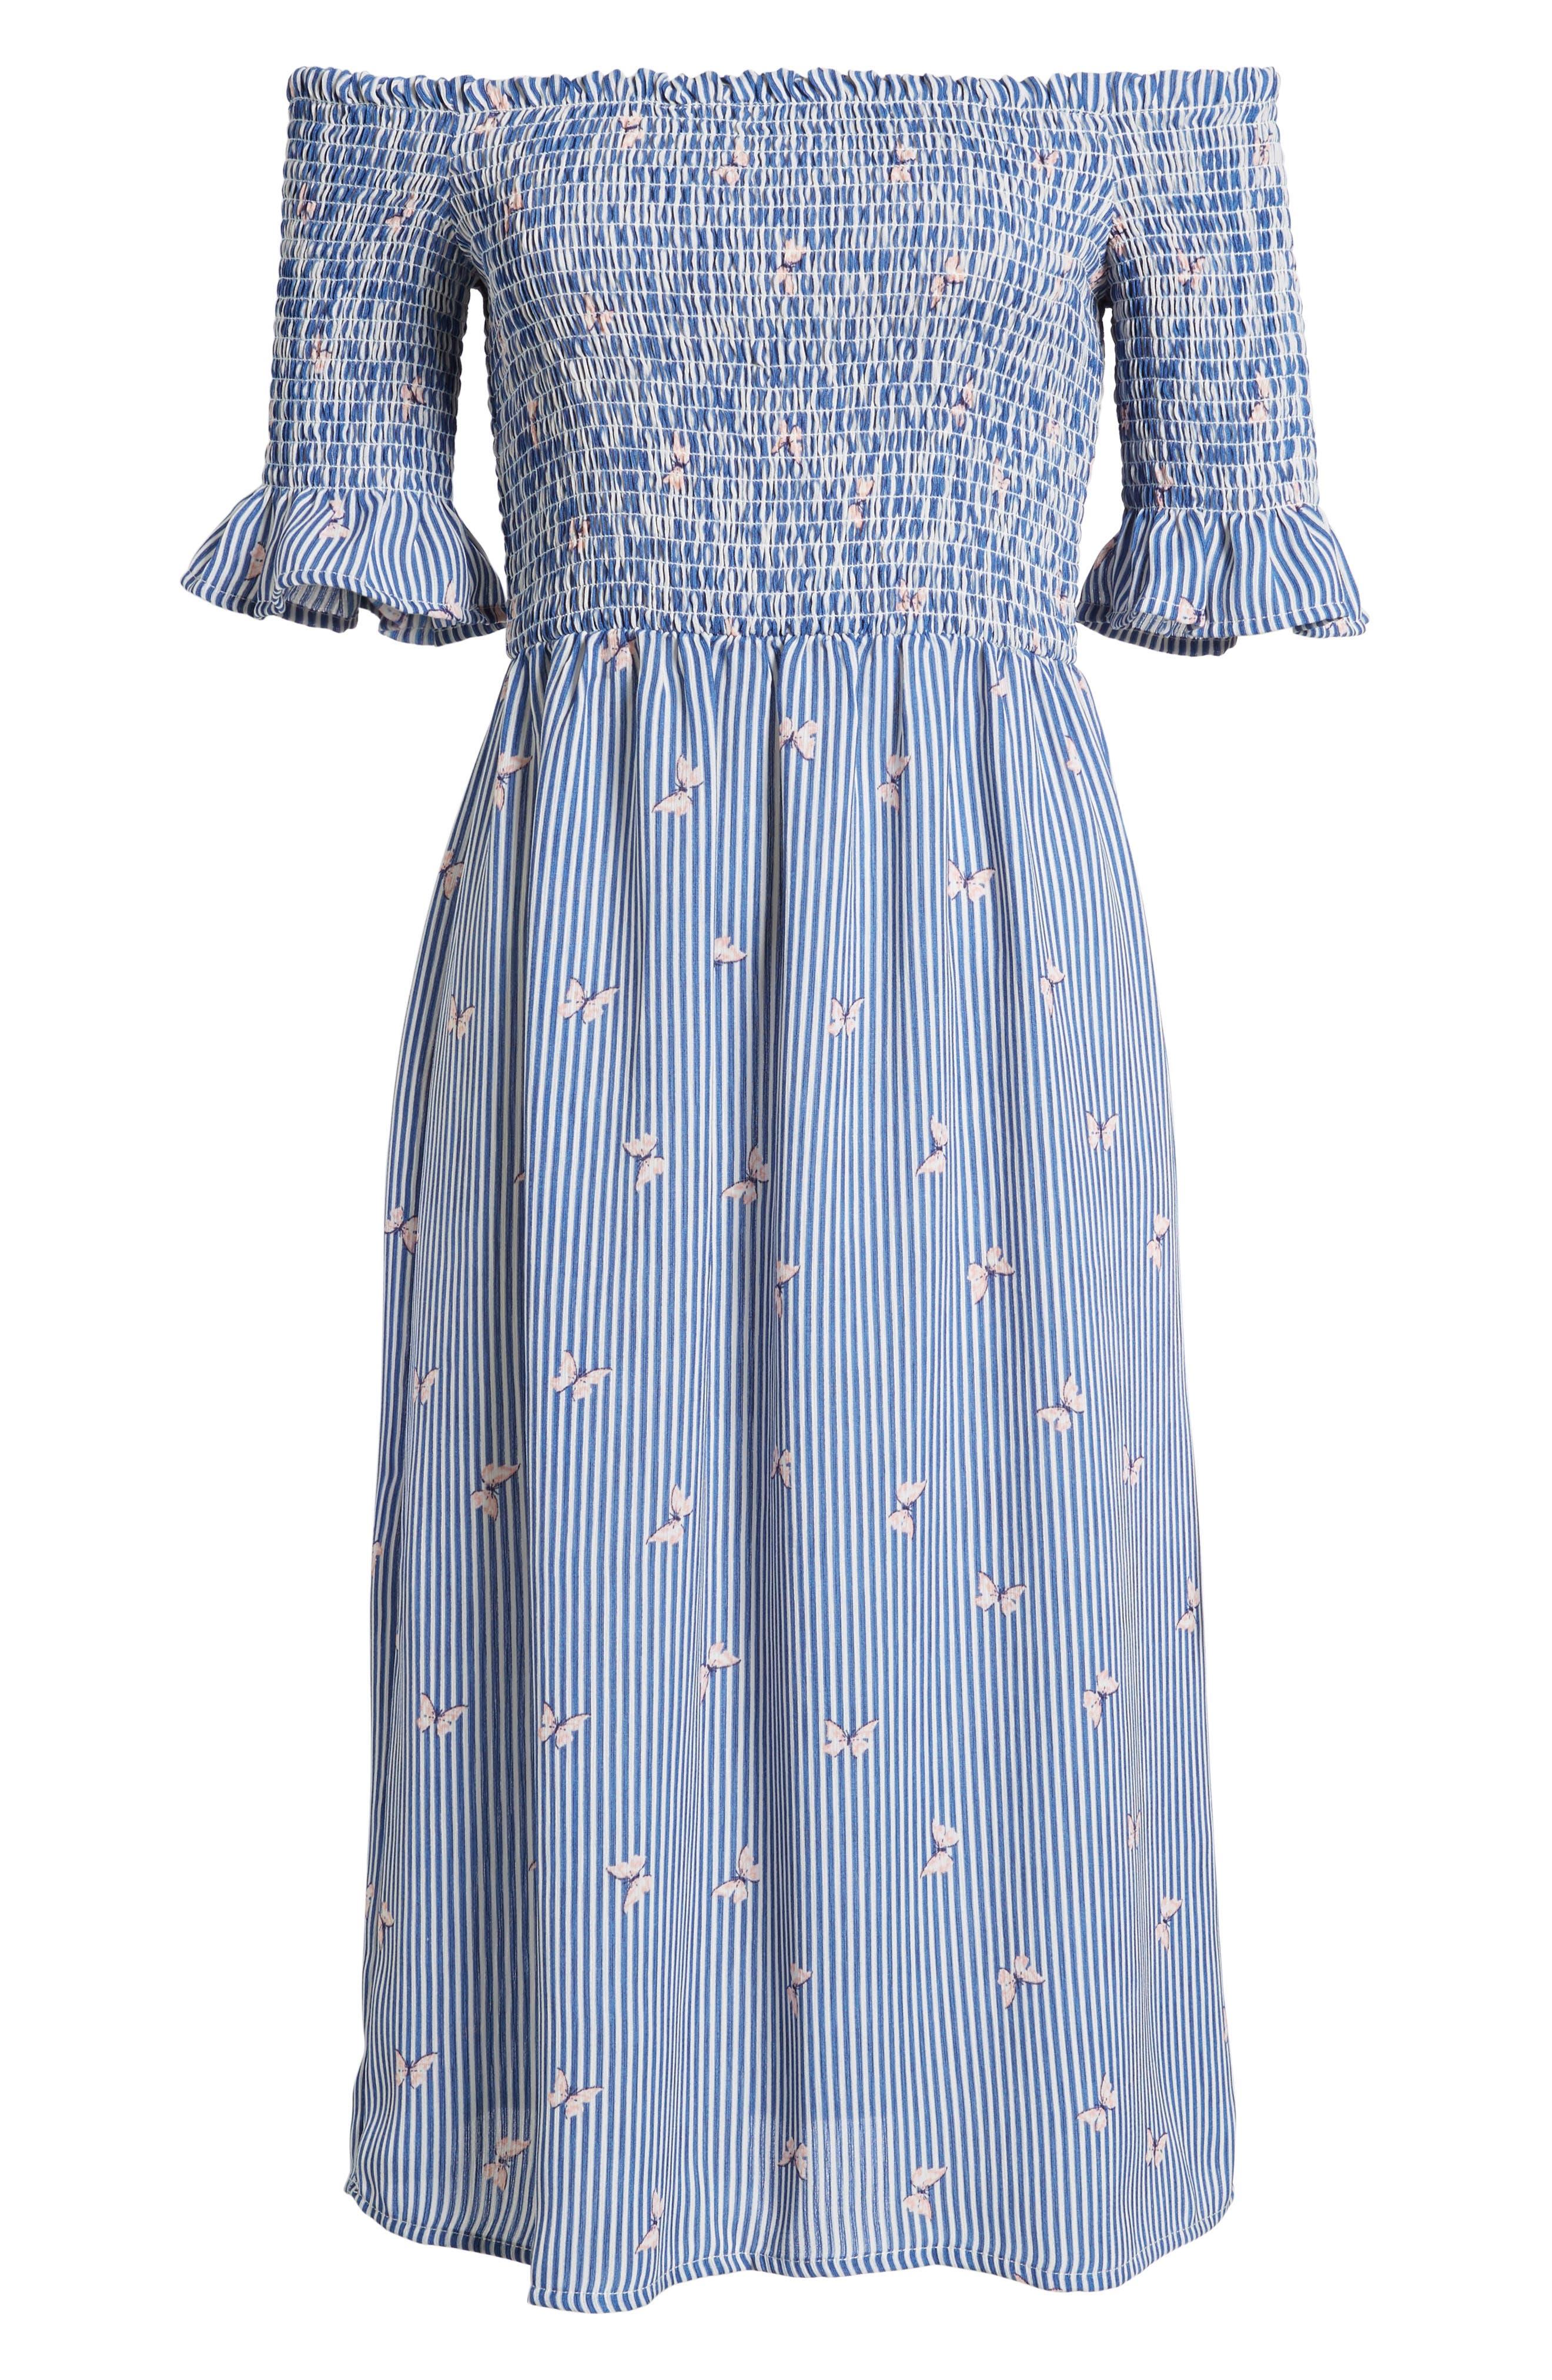 Smocked Midi Dress,                             Alternate thumbnail 6, color,                             Off White/ Blue